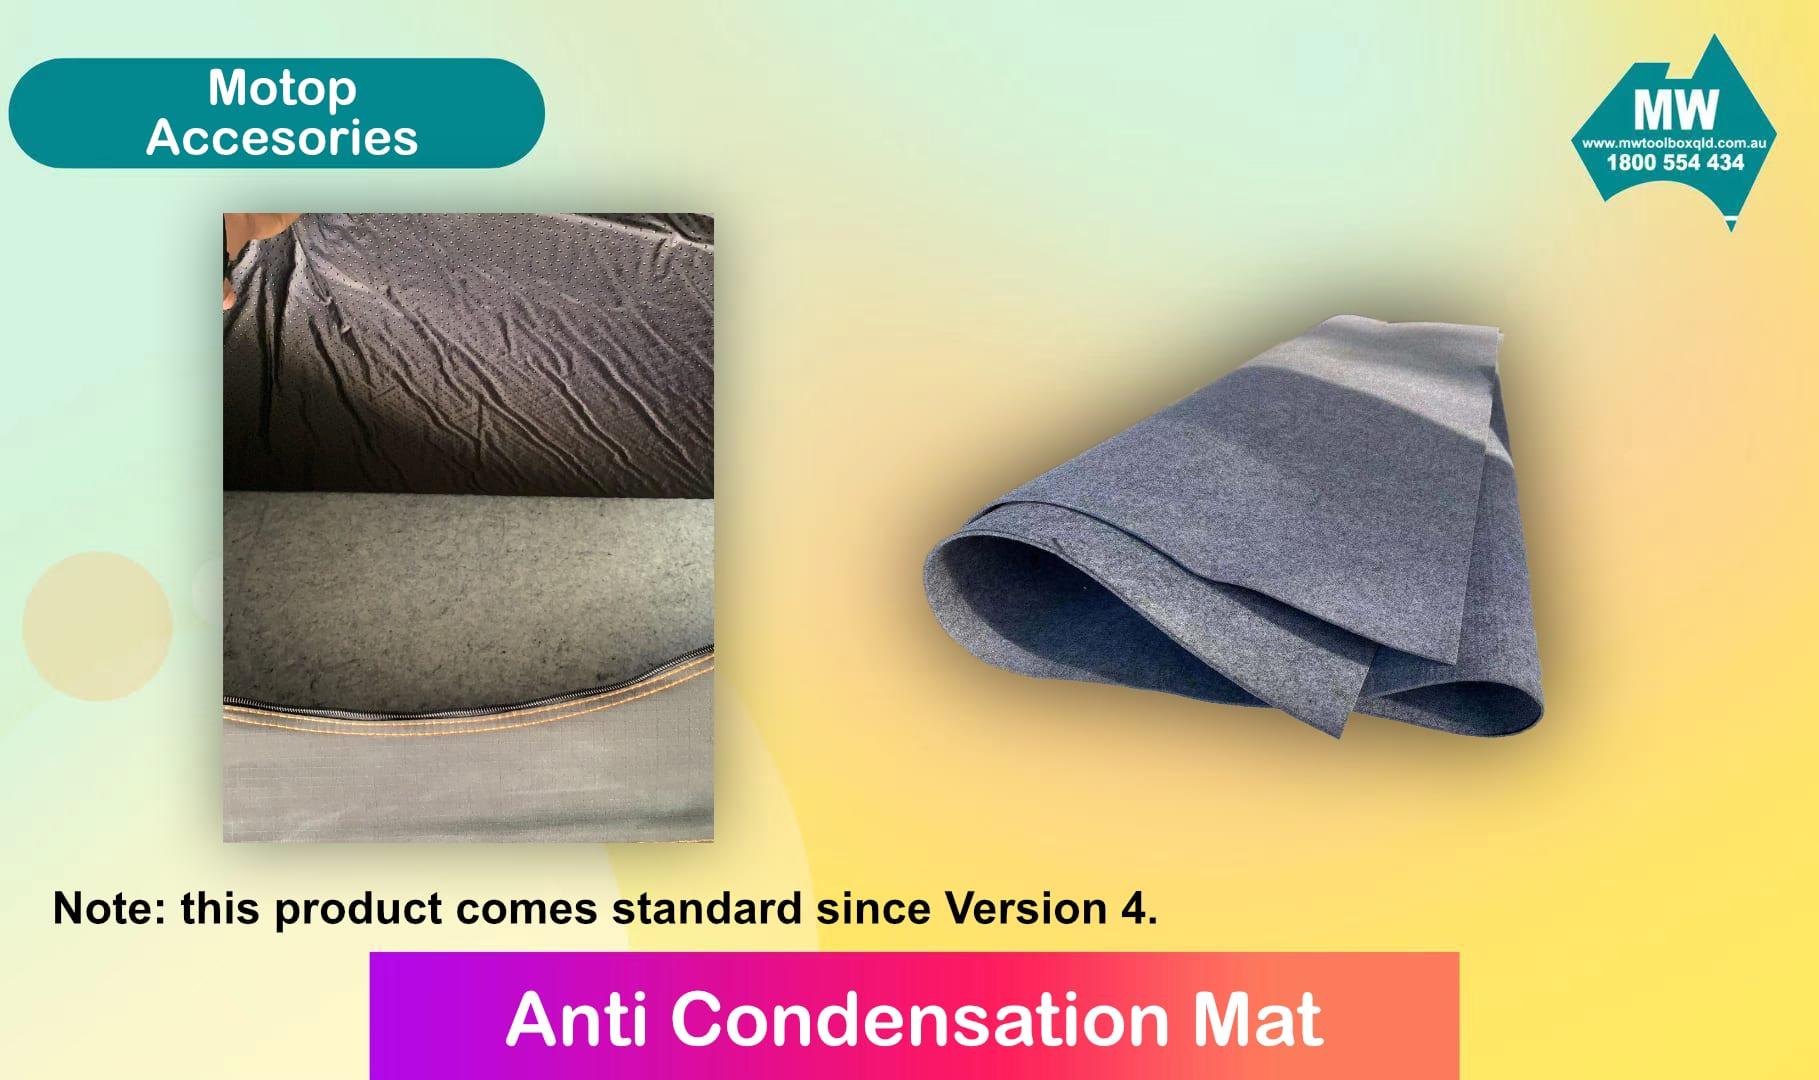 Anti-Condensation Mat